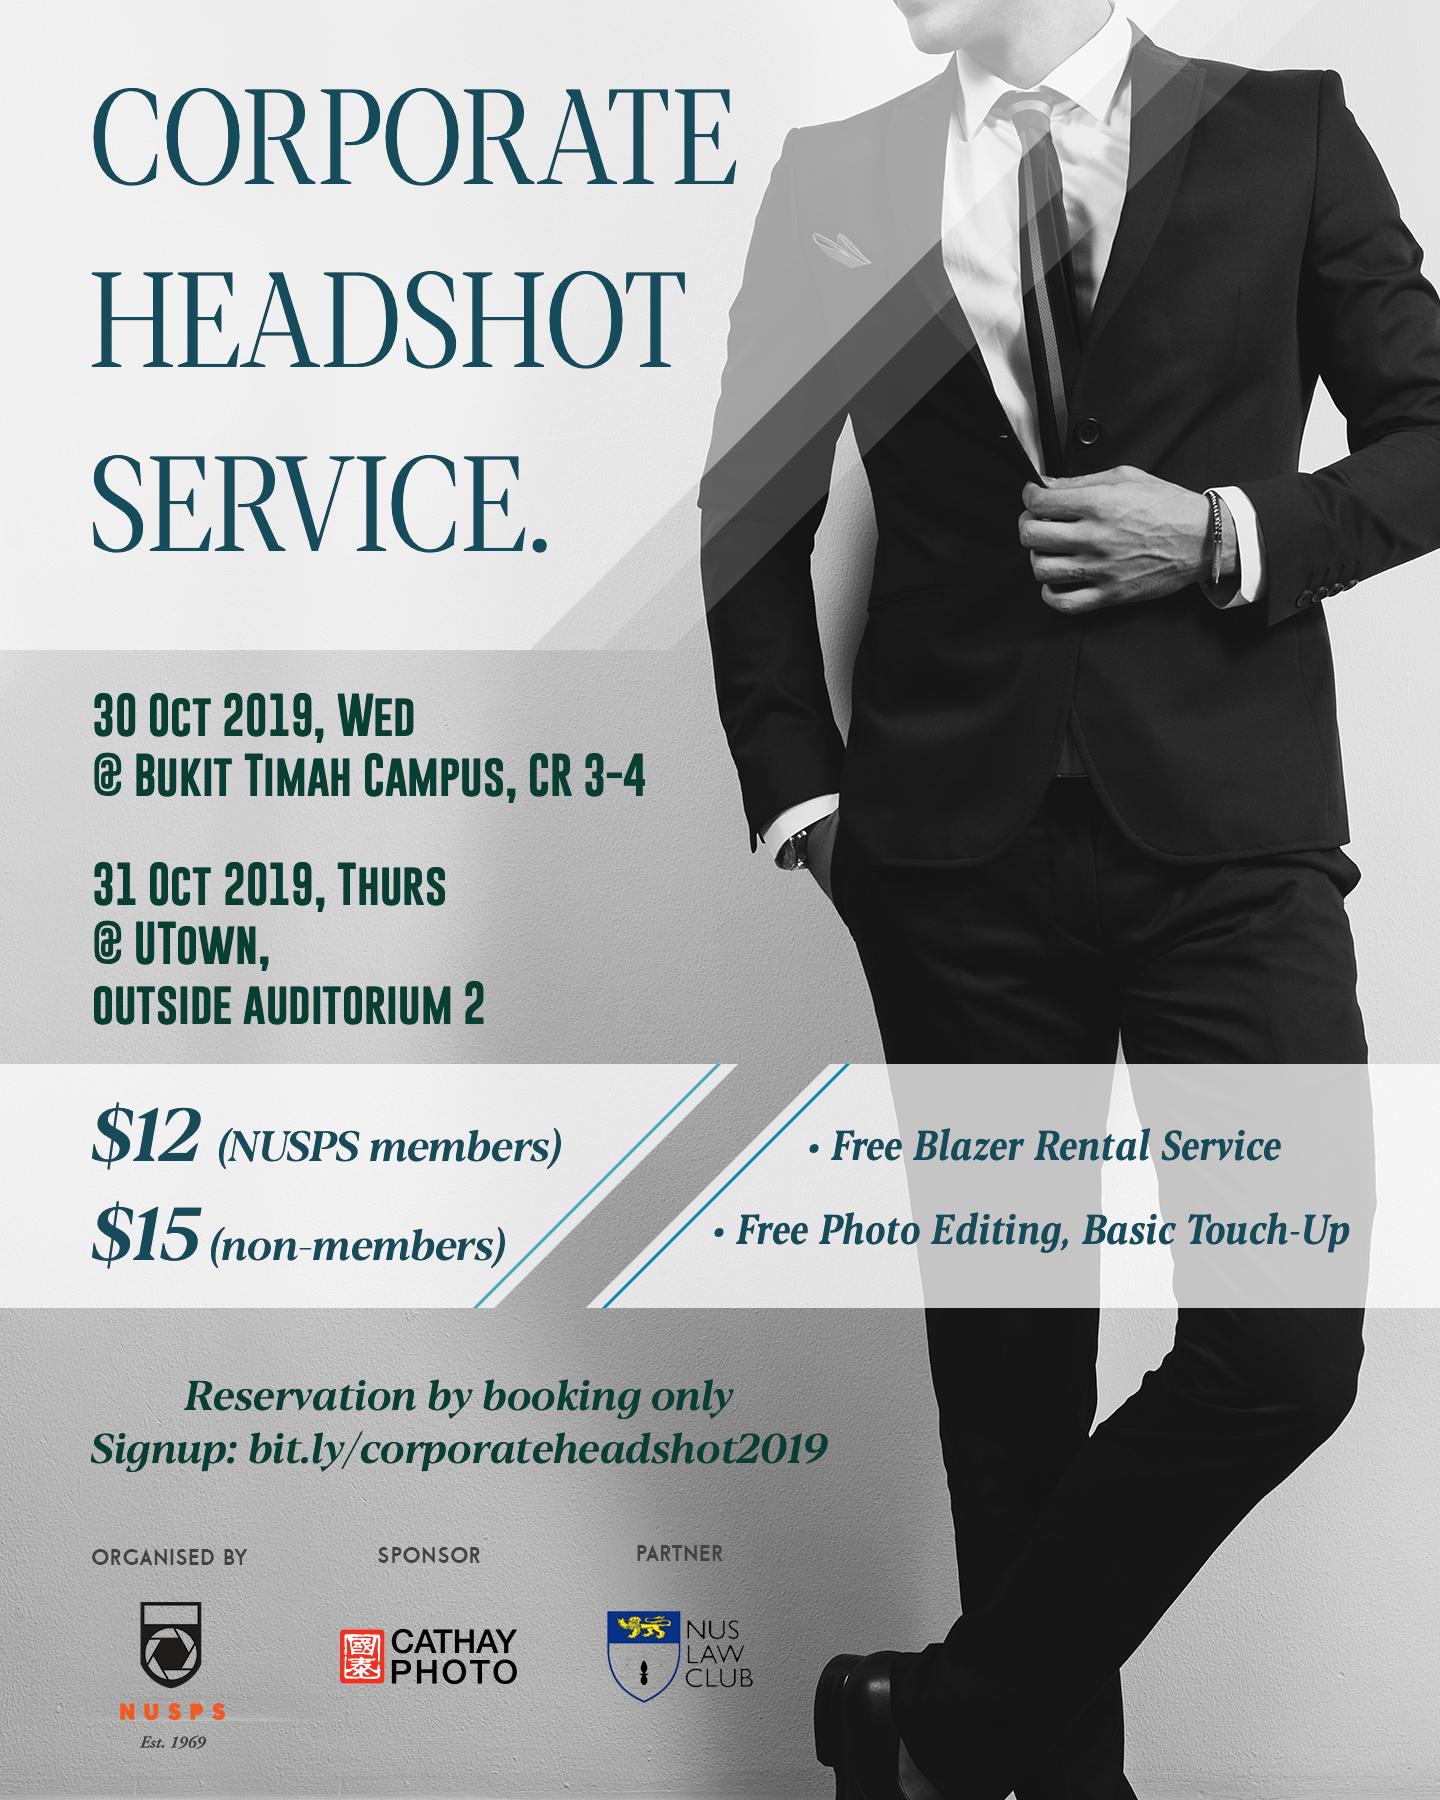 Corporate Headshot Service 2019